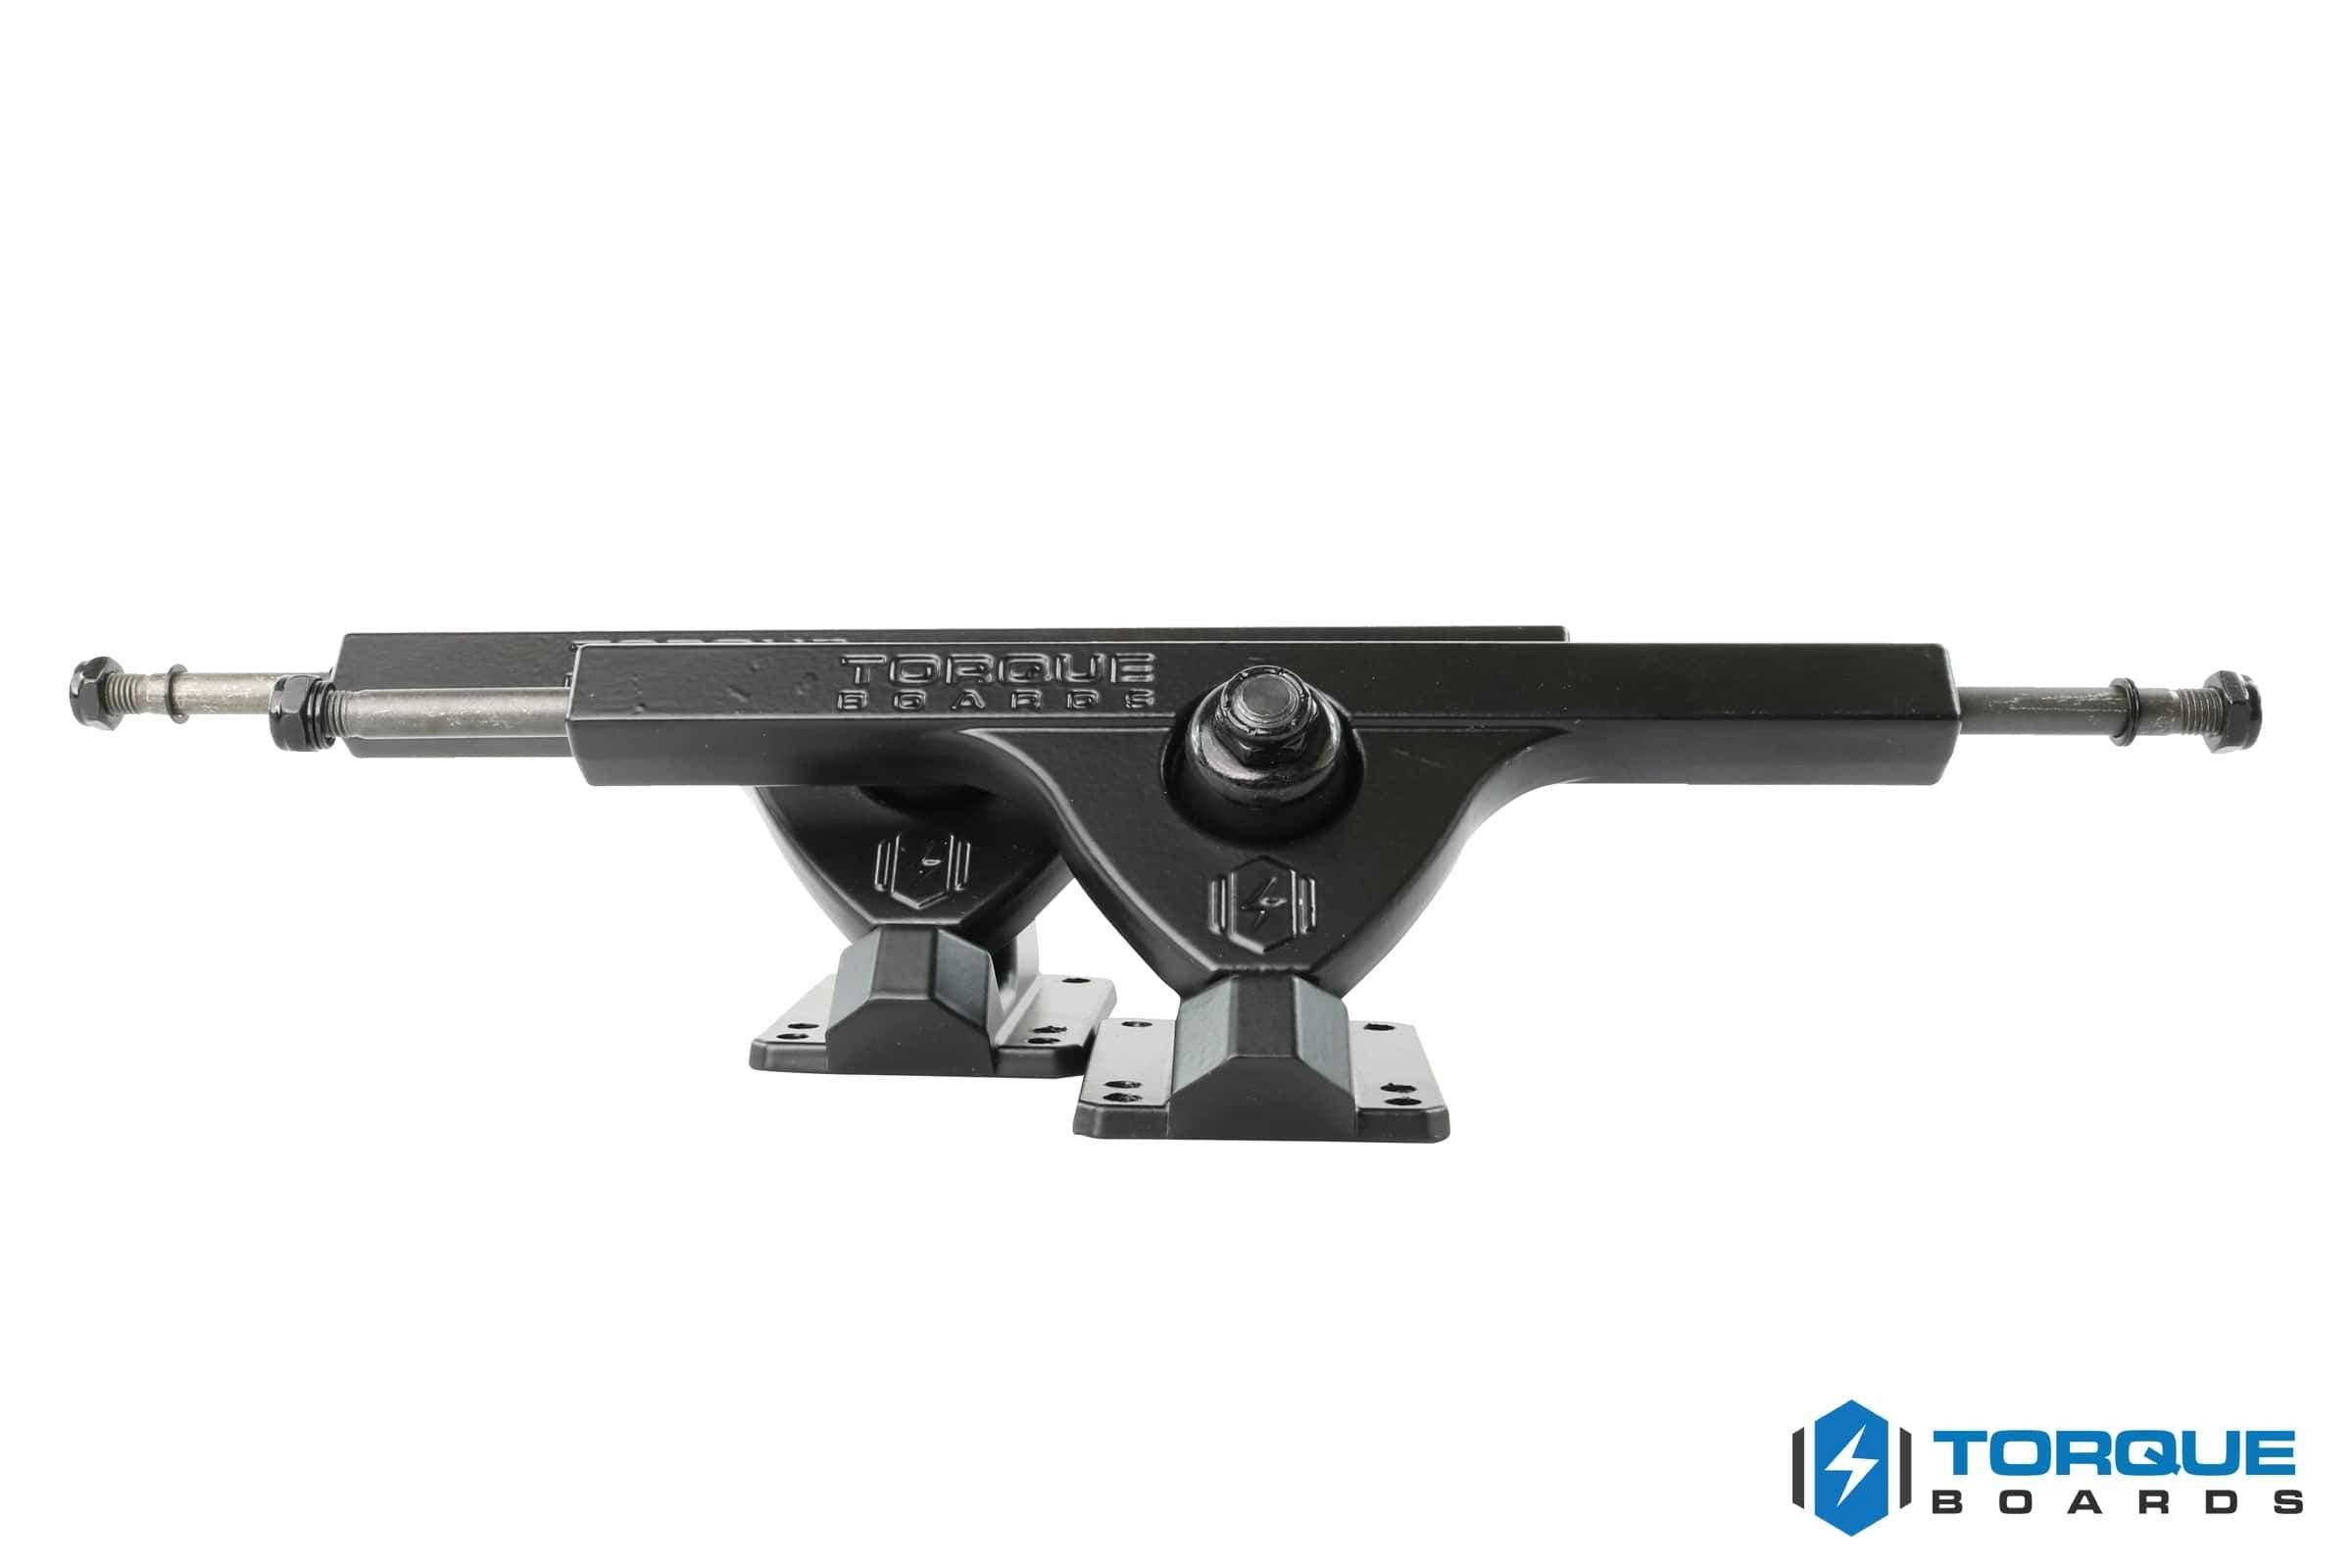 218mm_Truck_Set_Front_View-min_2400x